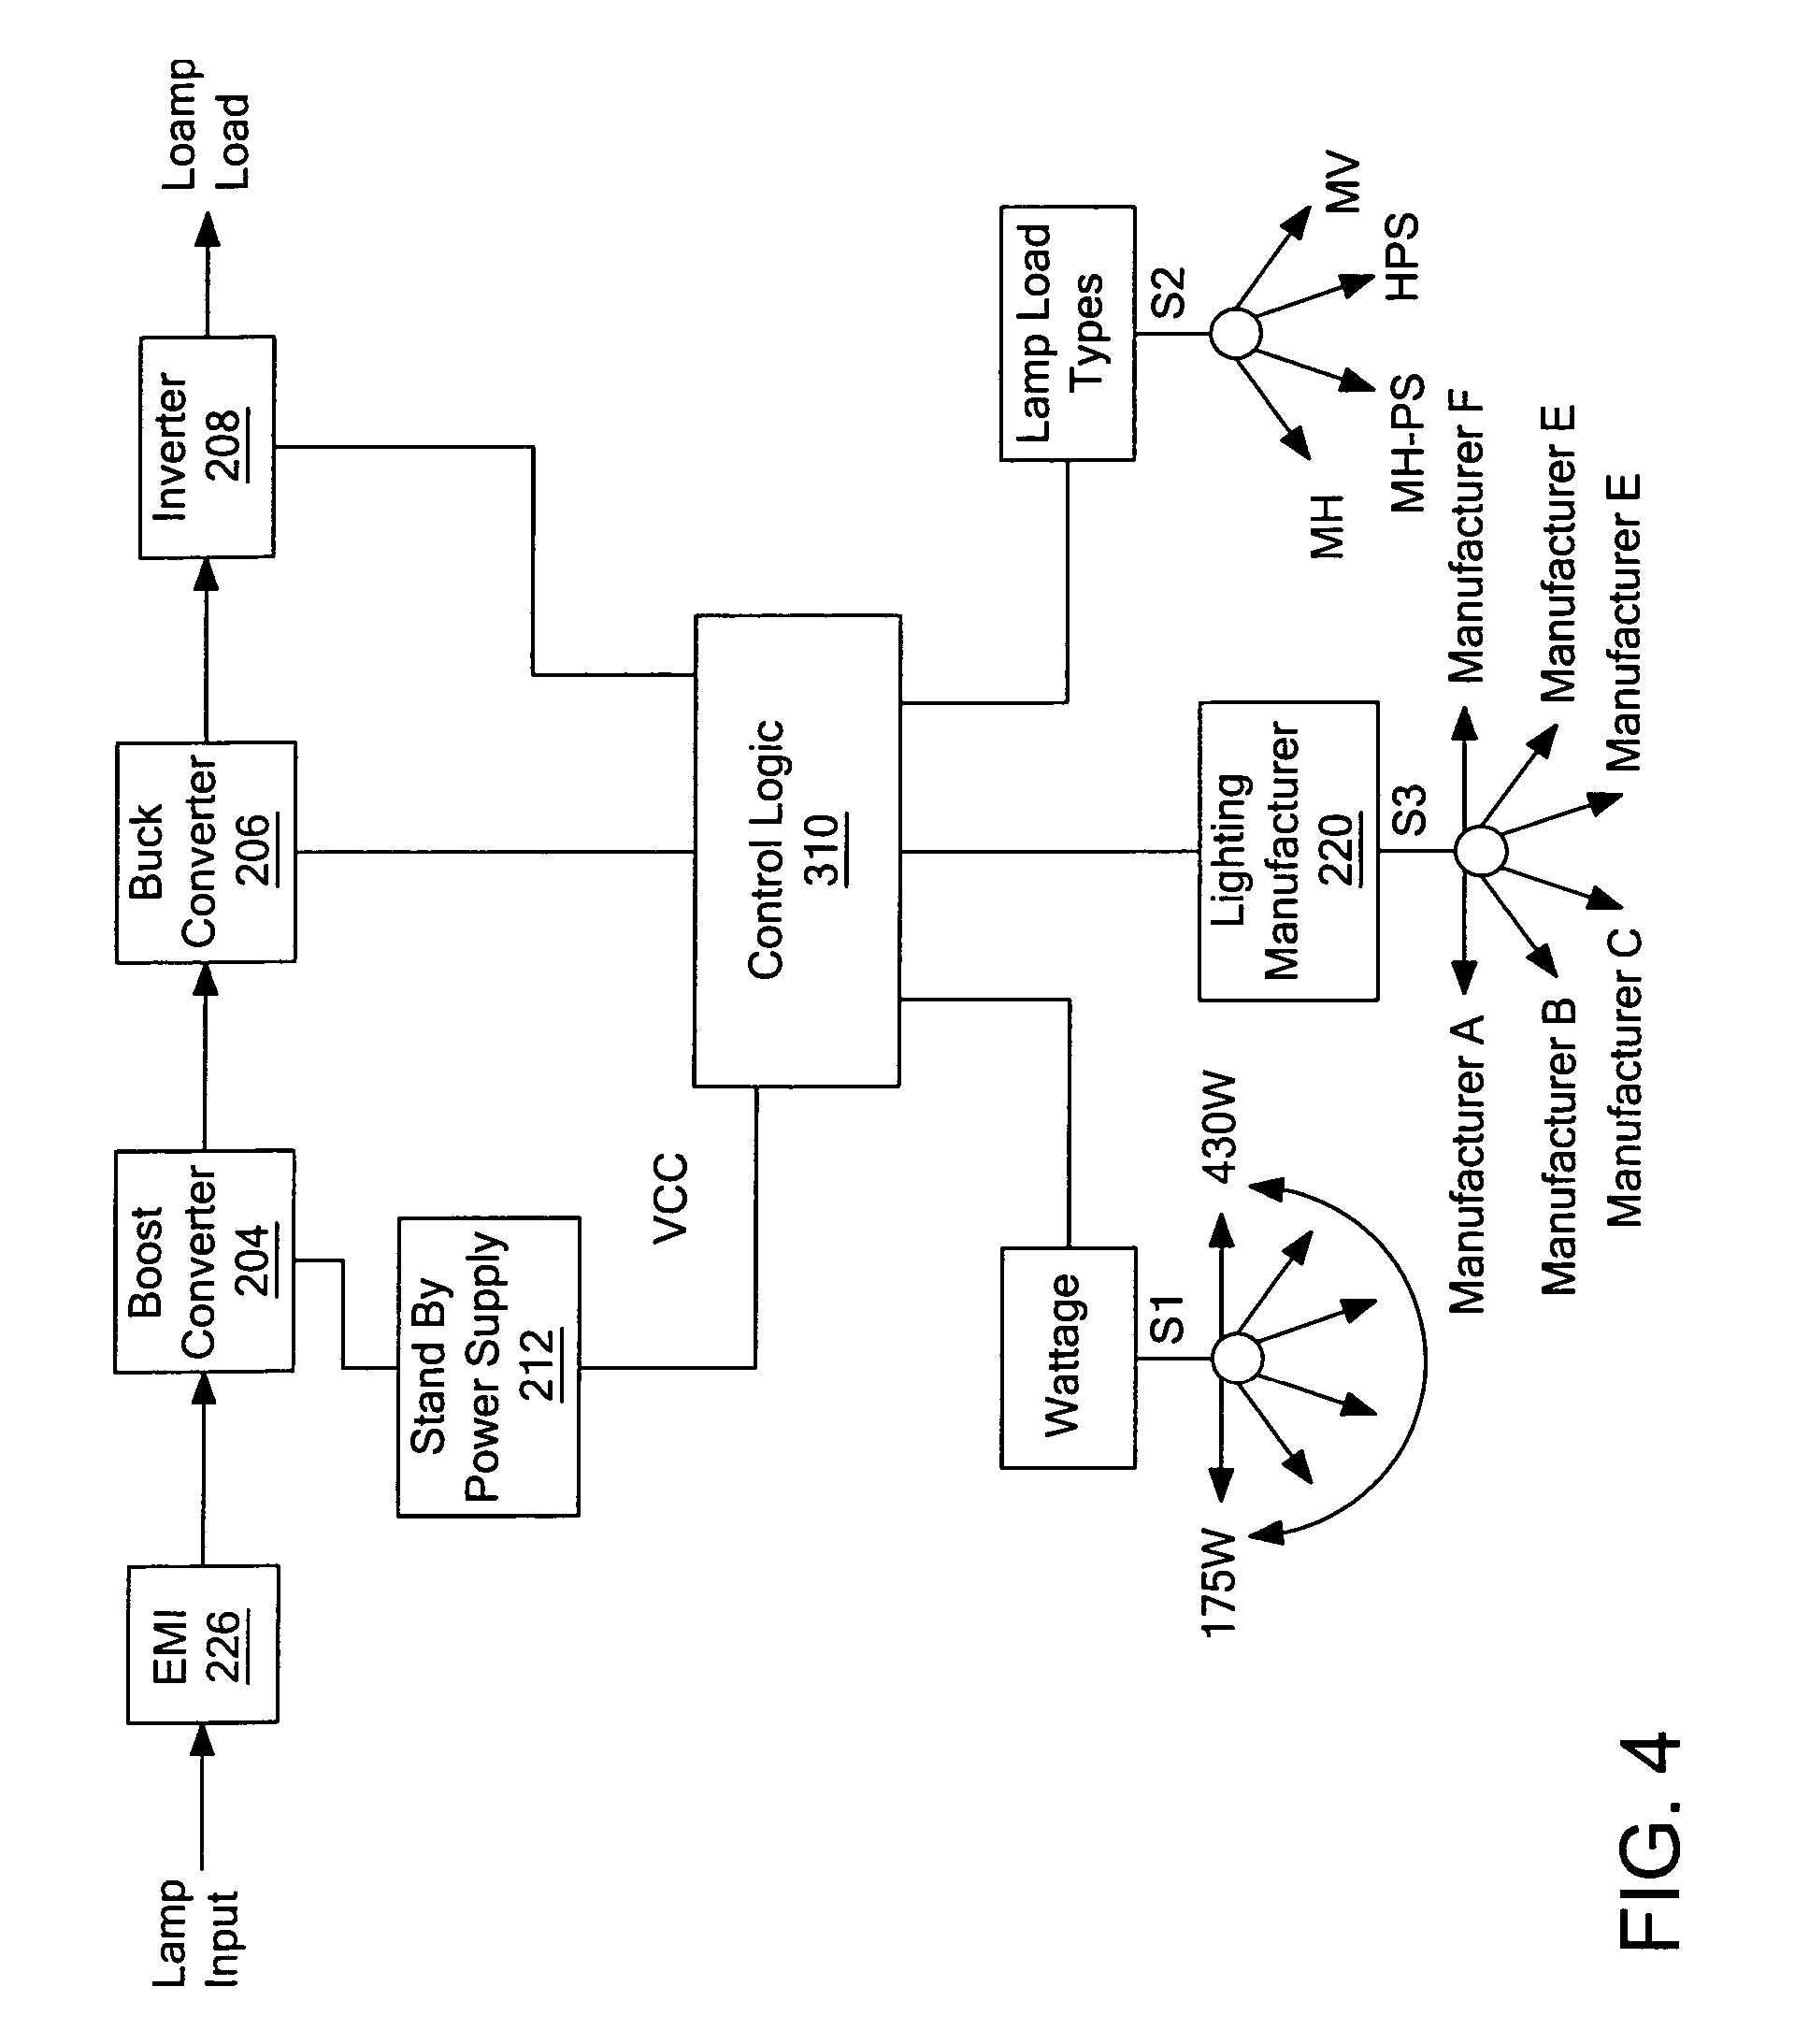 Circline Ballast Wiring Diagram High Pressure Sodium